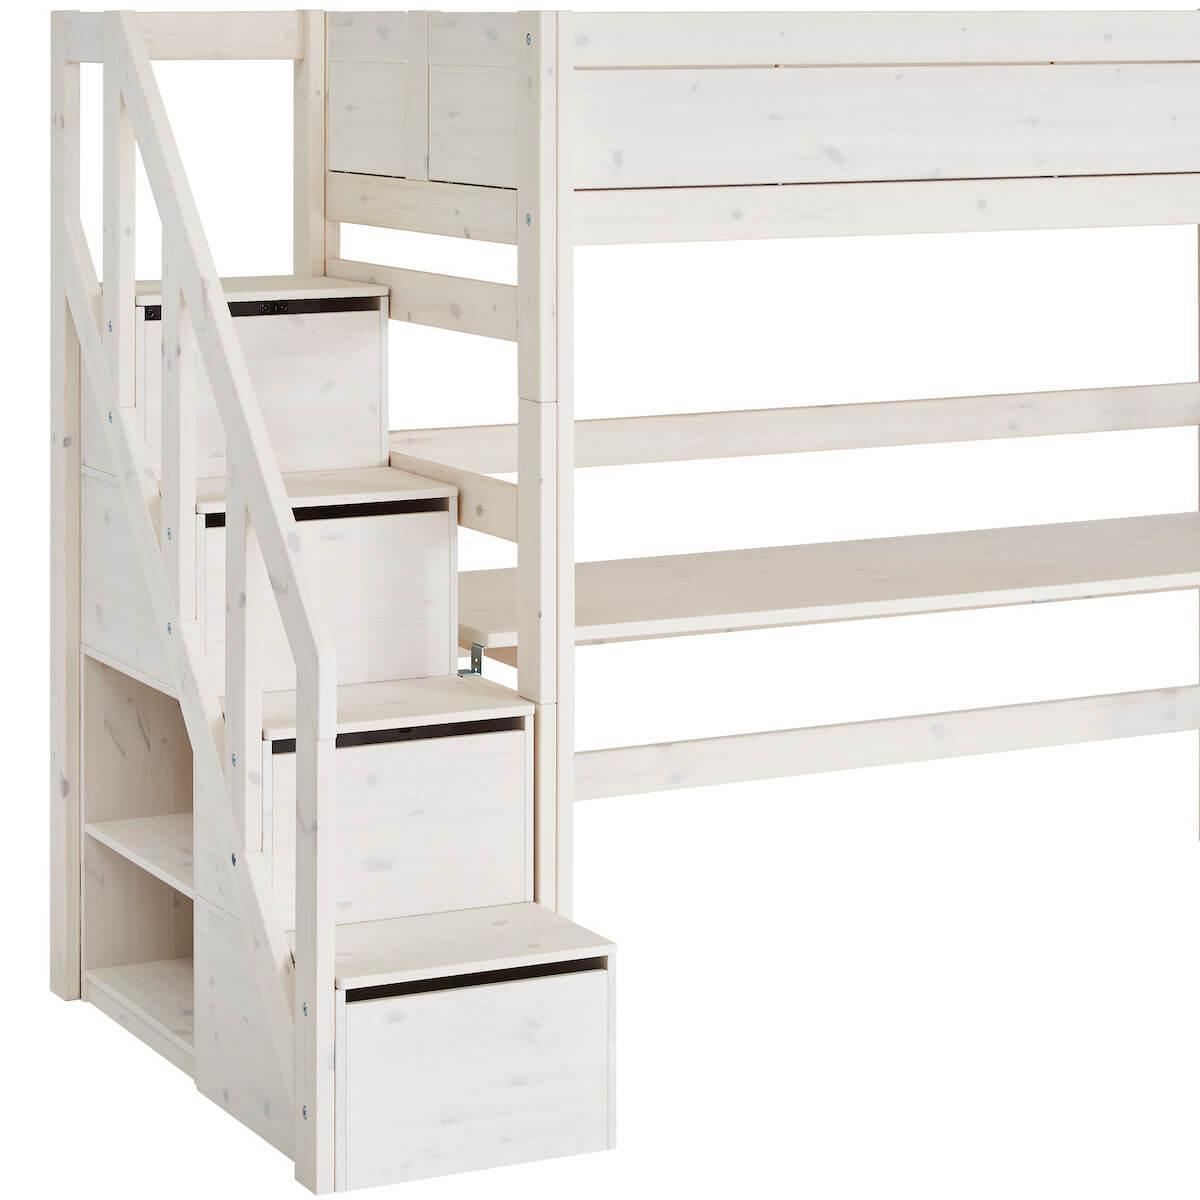 Lit mezzanine 90x200cm escalier Lifetime whitewash